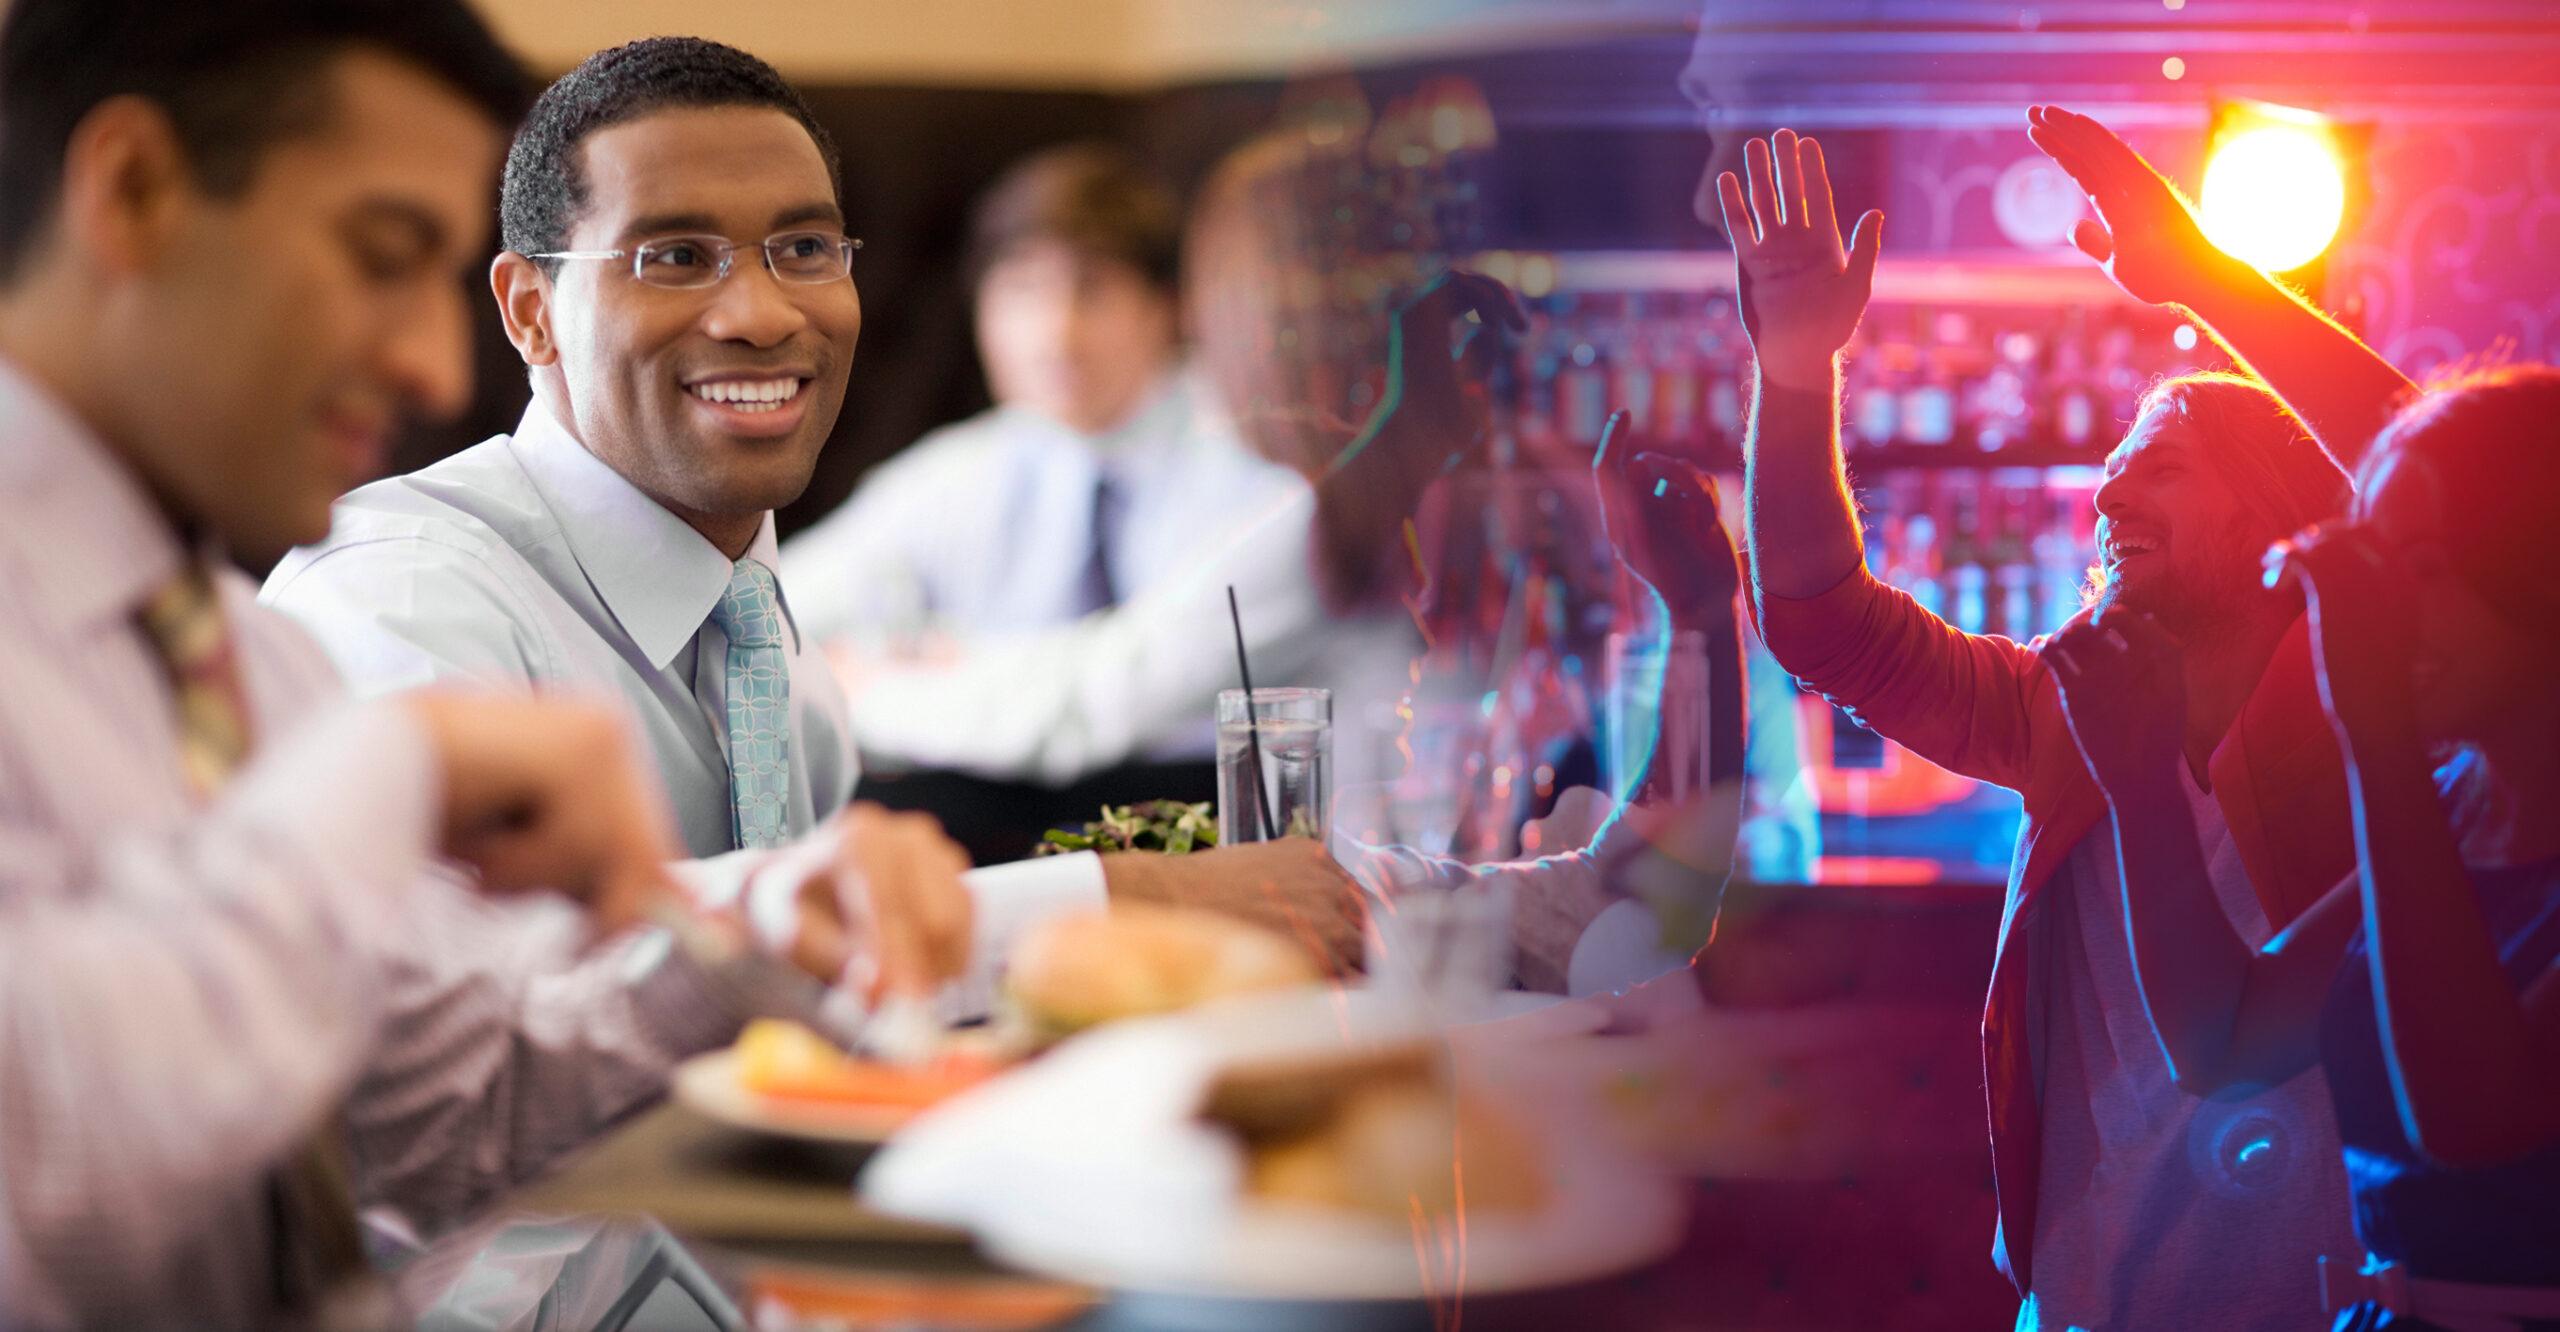 Restaurants & Nightlife